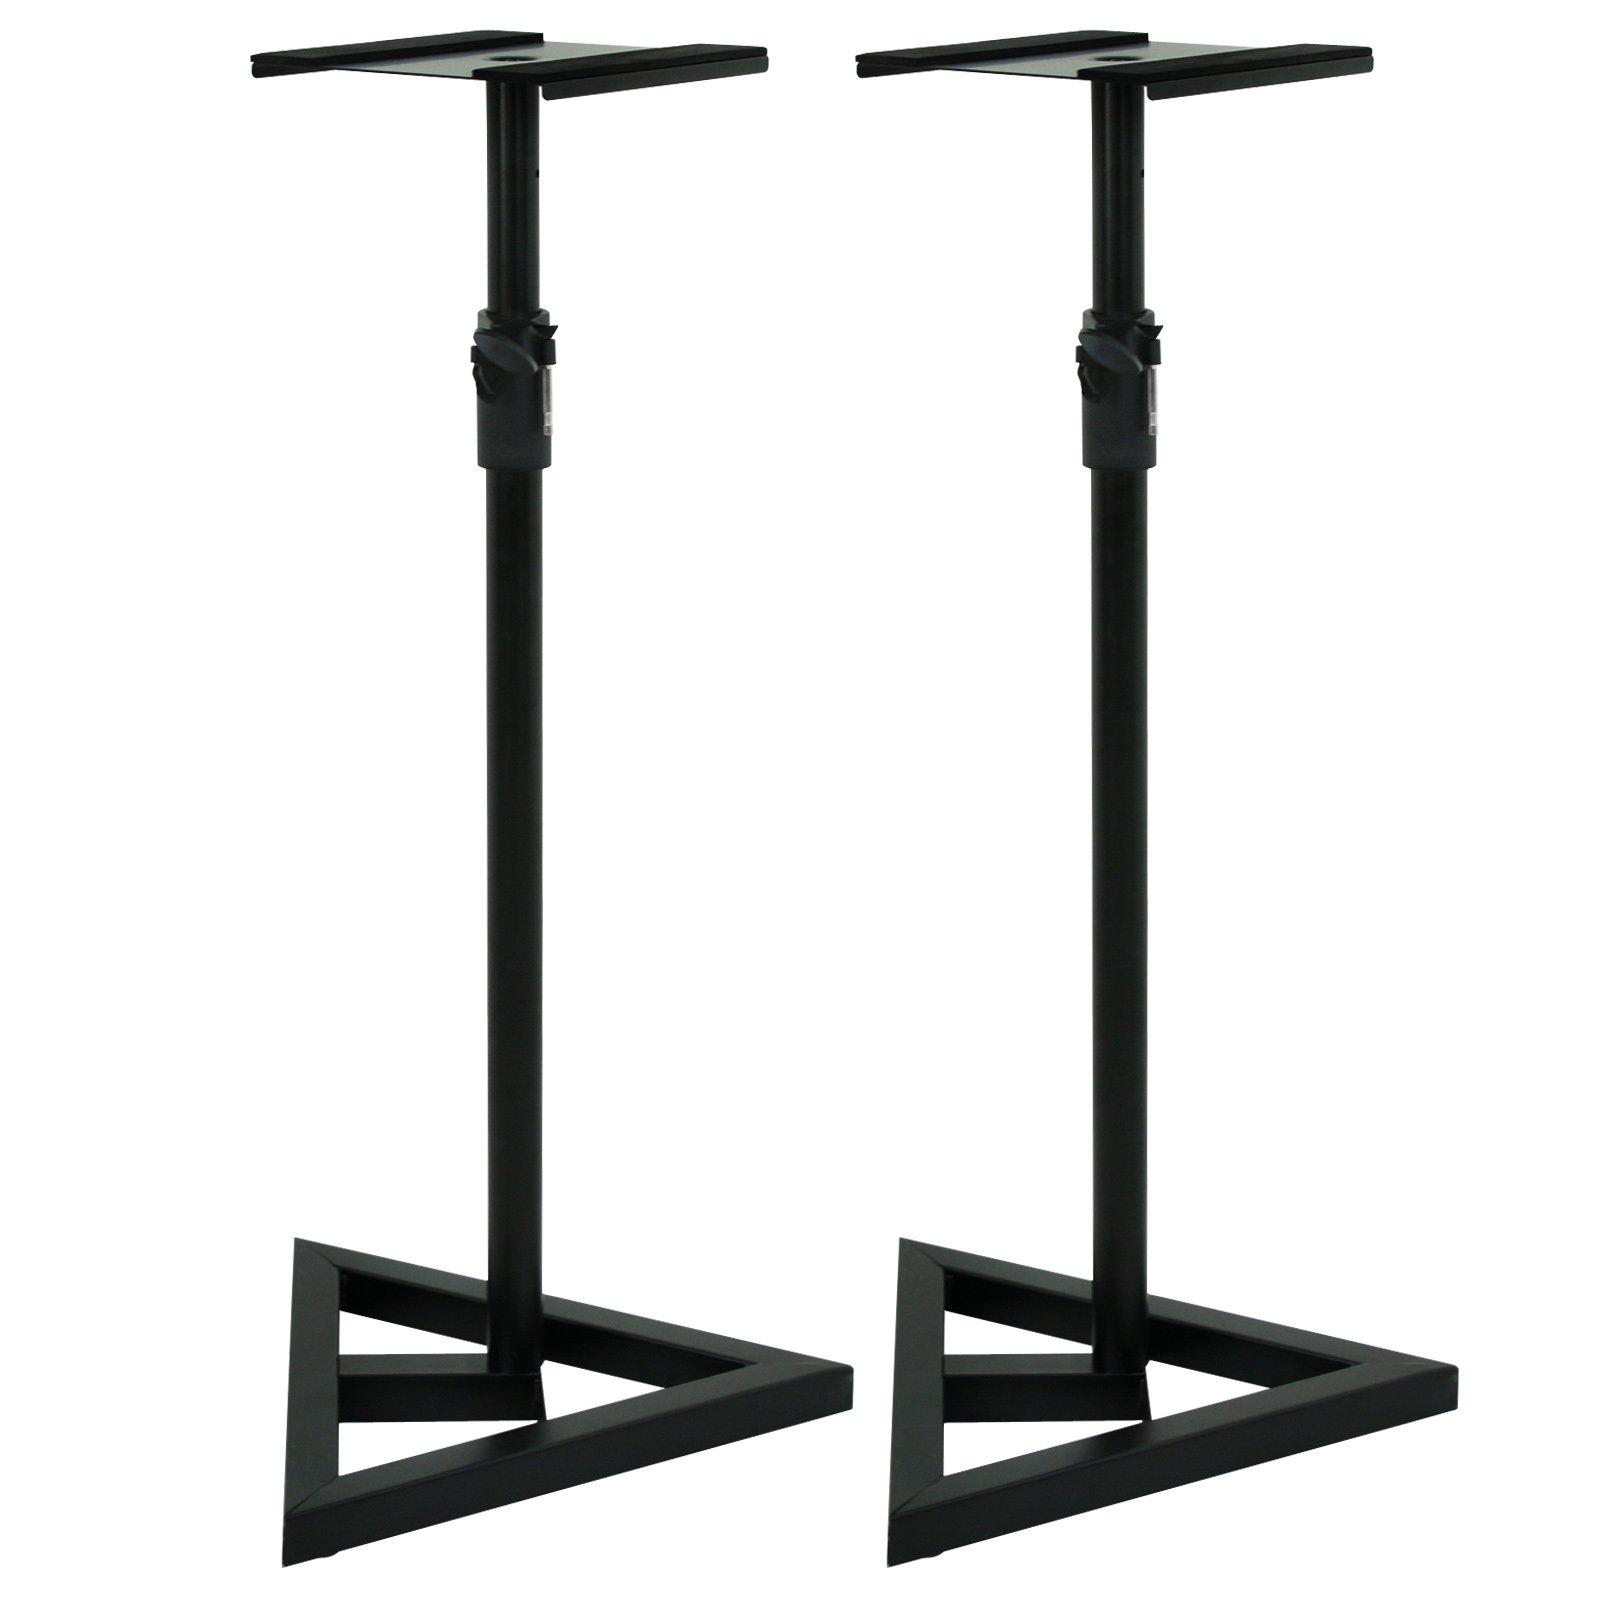 ZENY Height Adjustable 2 Studio Monitor Speaker Stands Heavy Duty Metal Triangle Pair Steel Stands